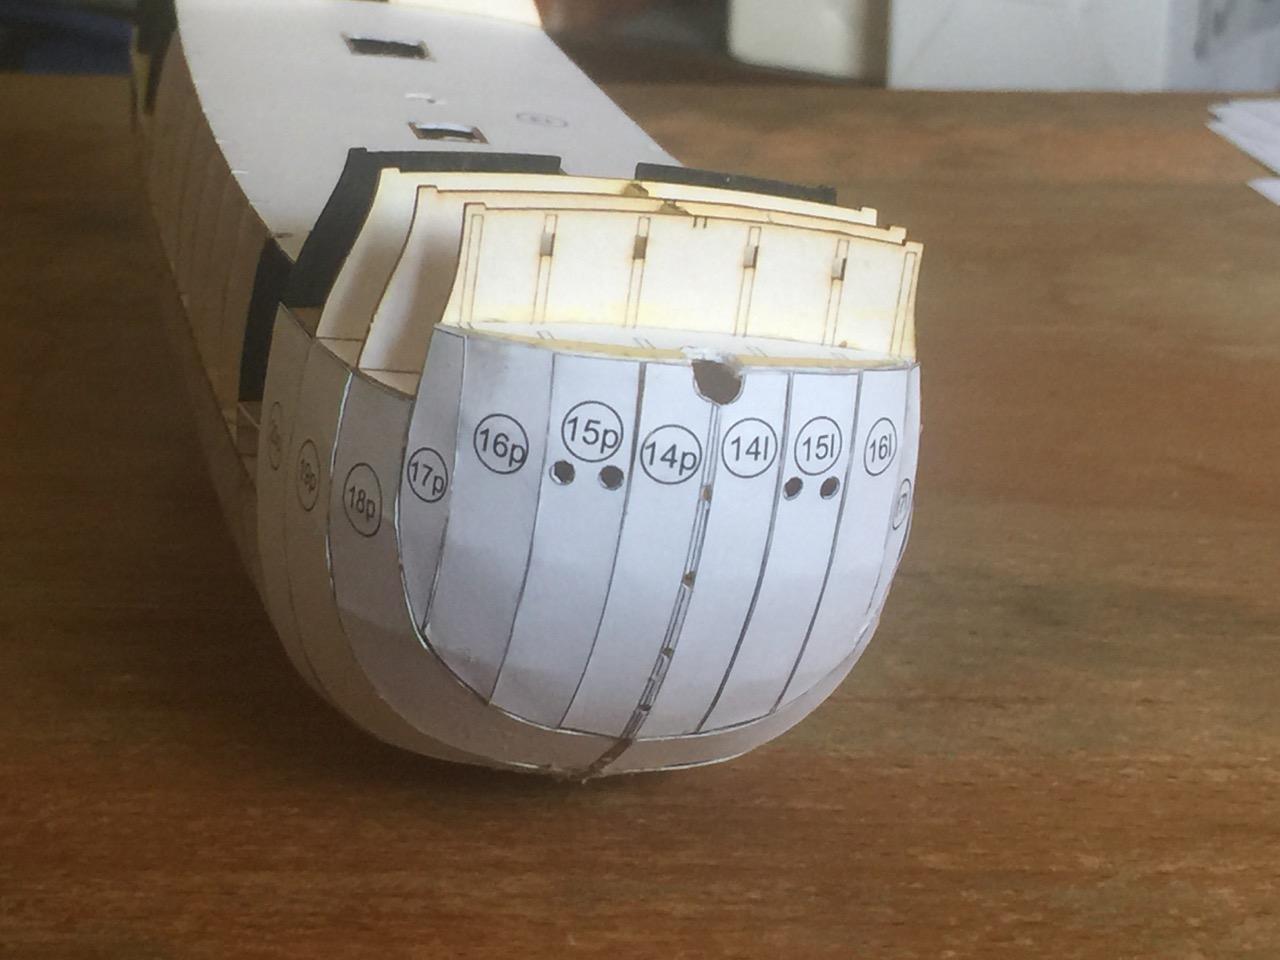 Schwarzer Rabe paper model kit